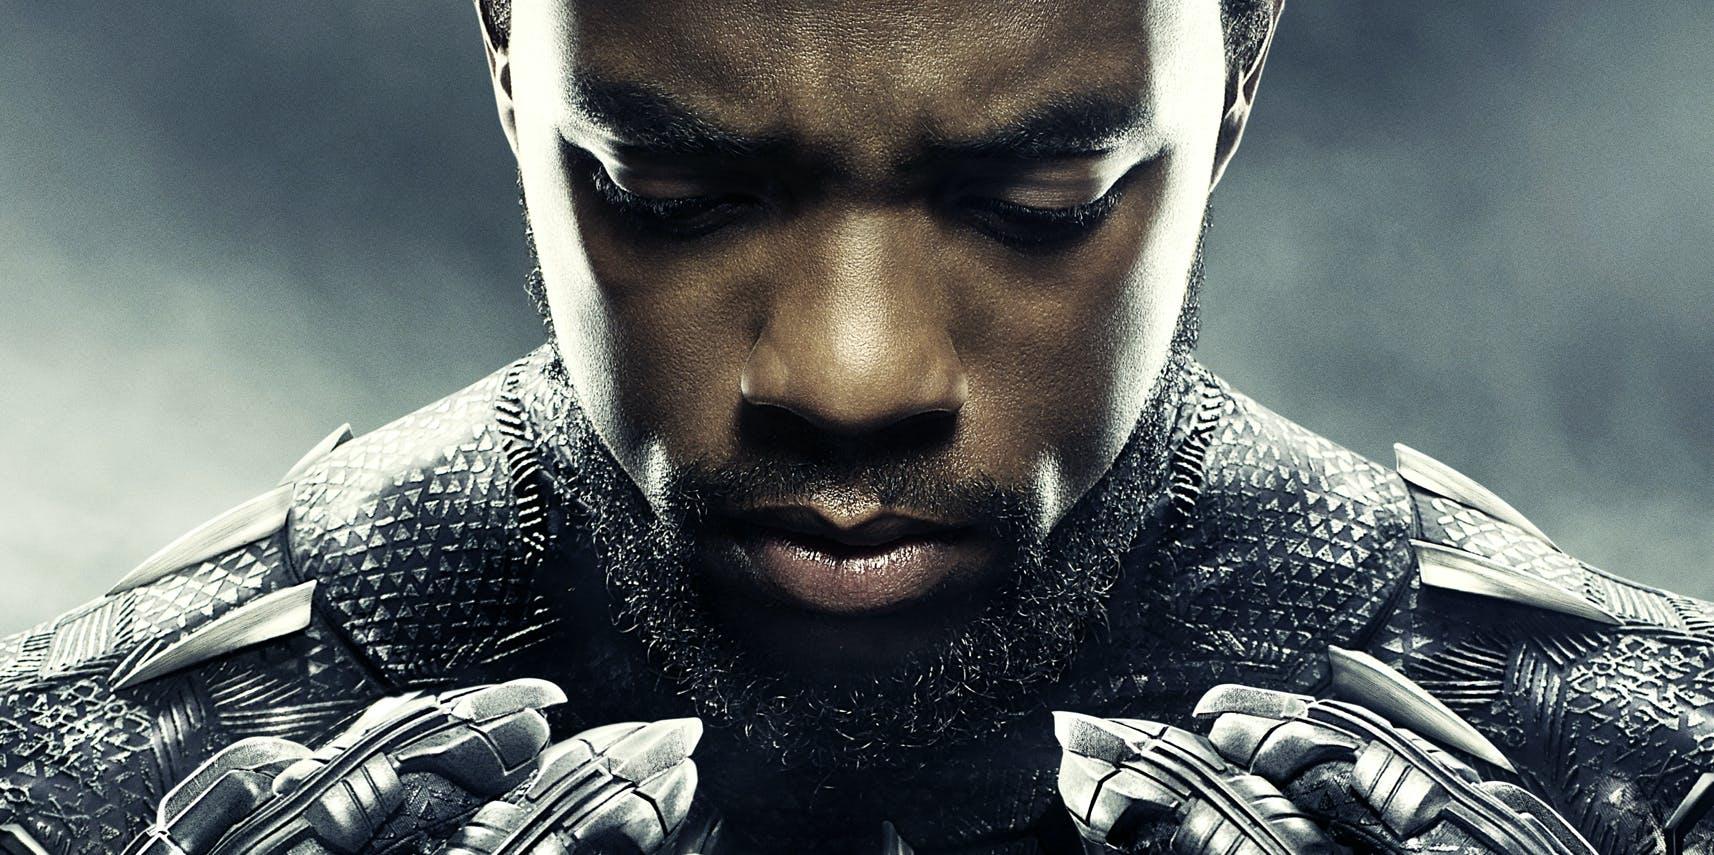 Resultado de imagen para black panther poster